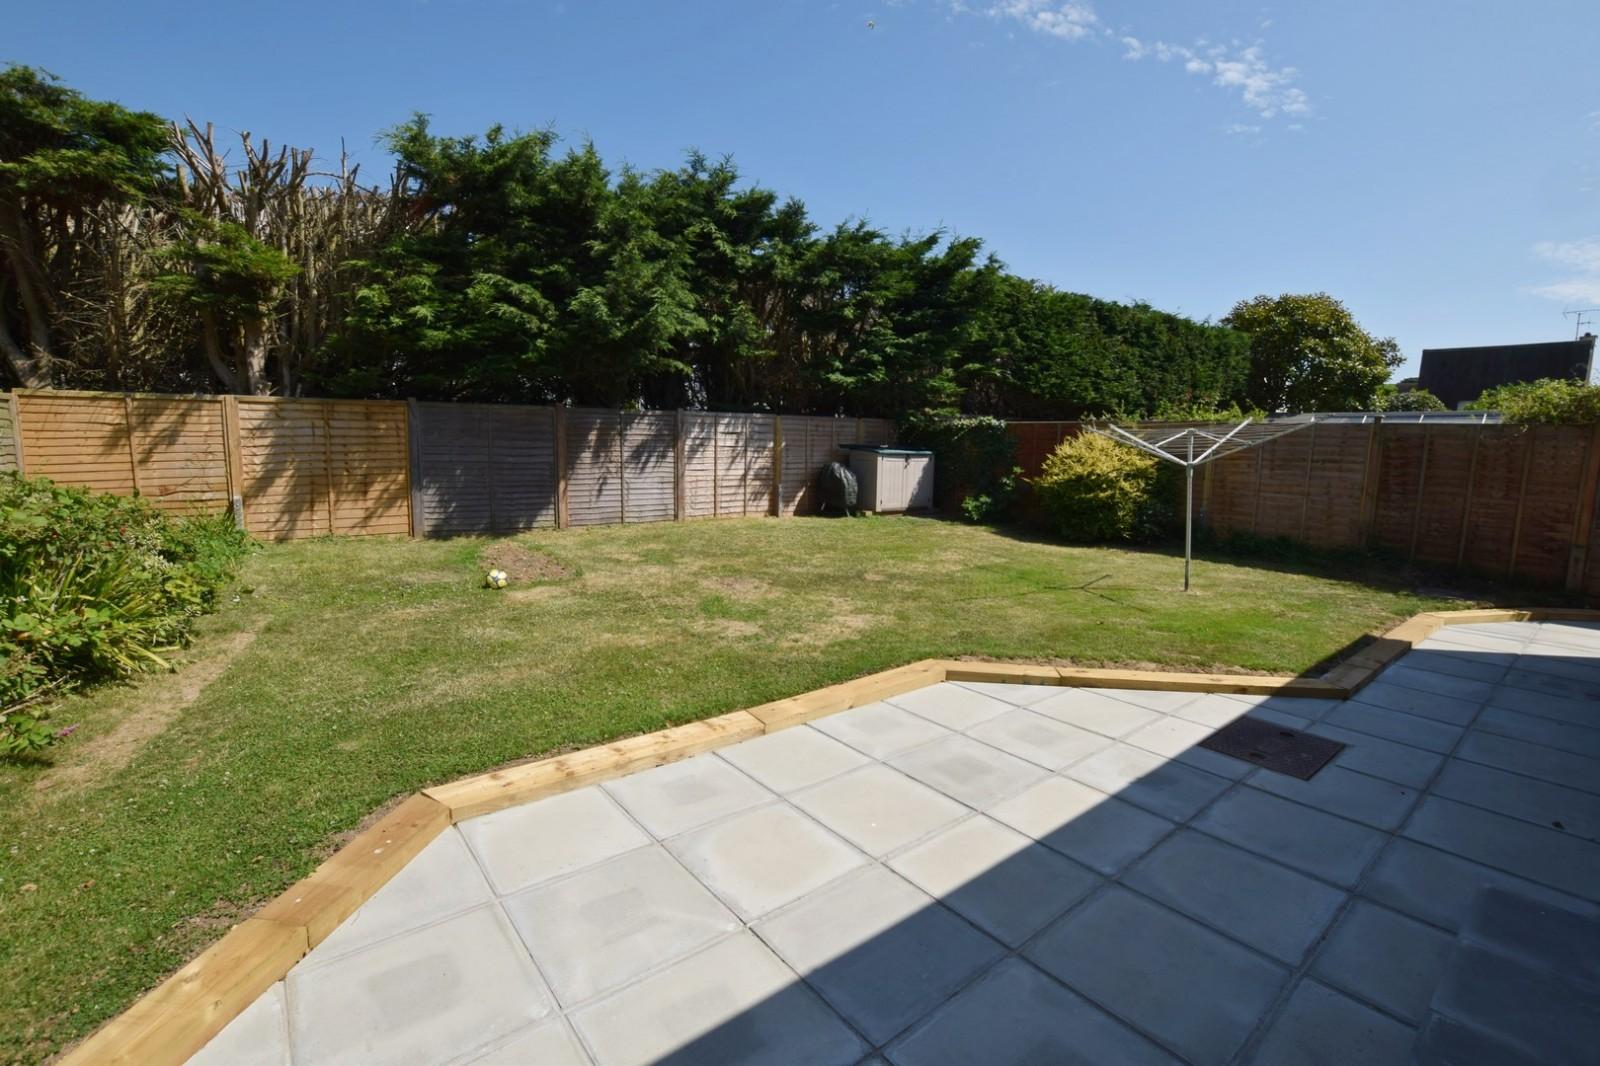 Garden House in Felpham